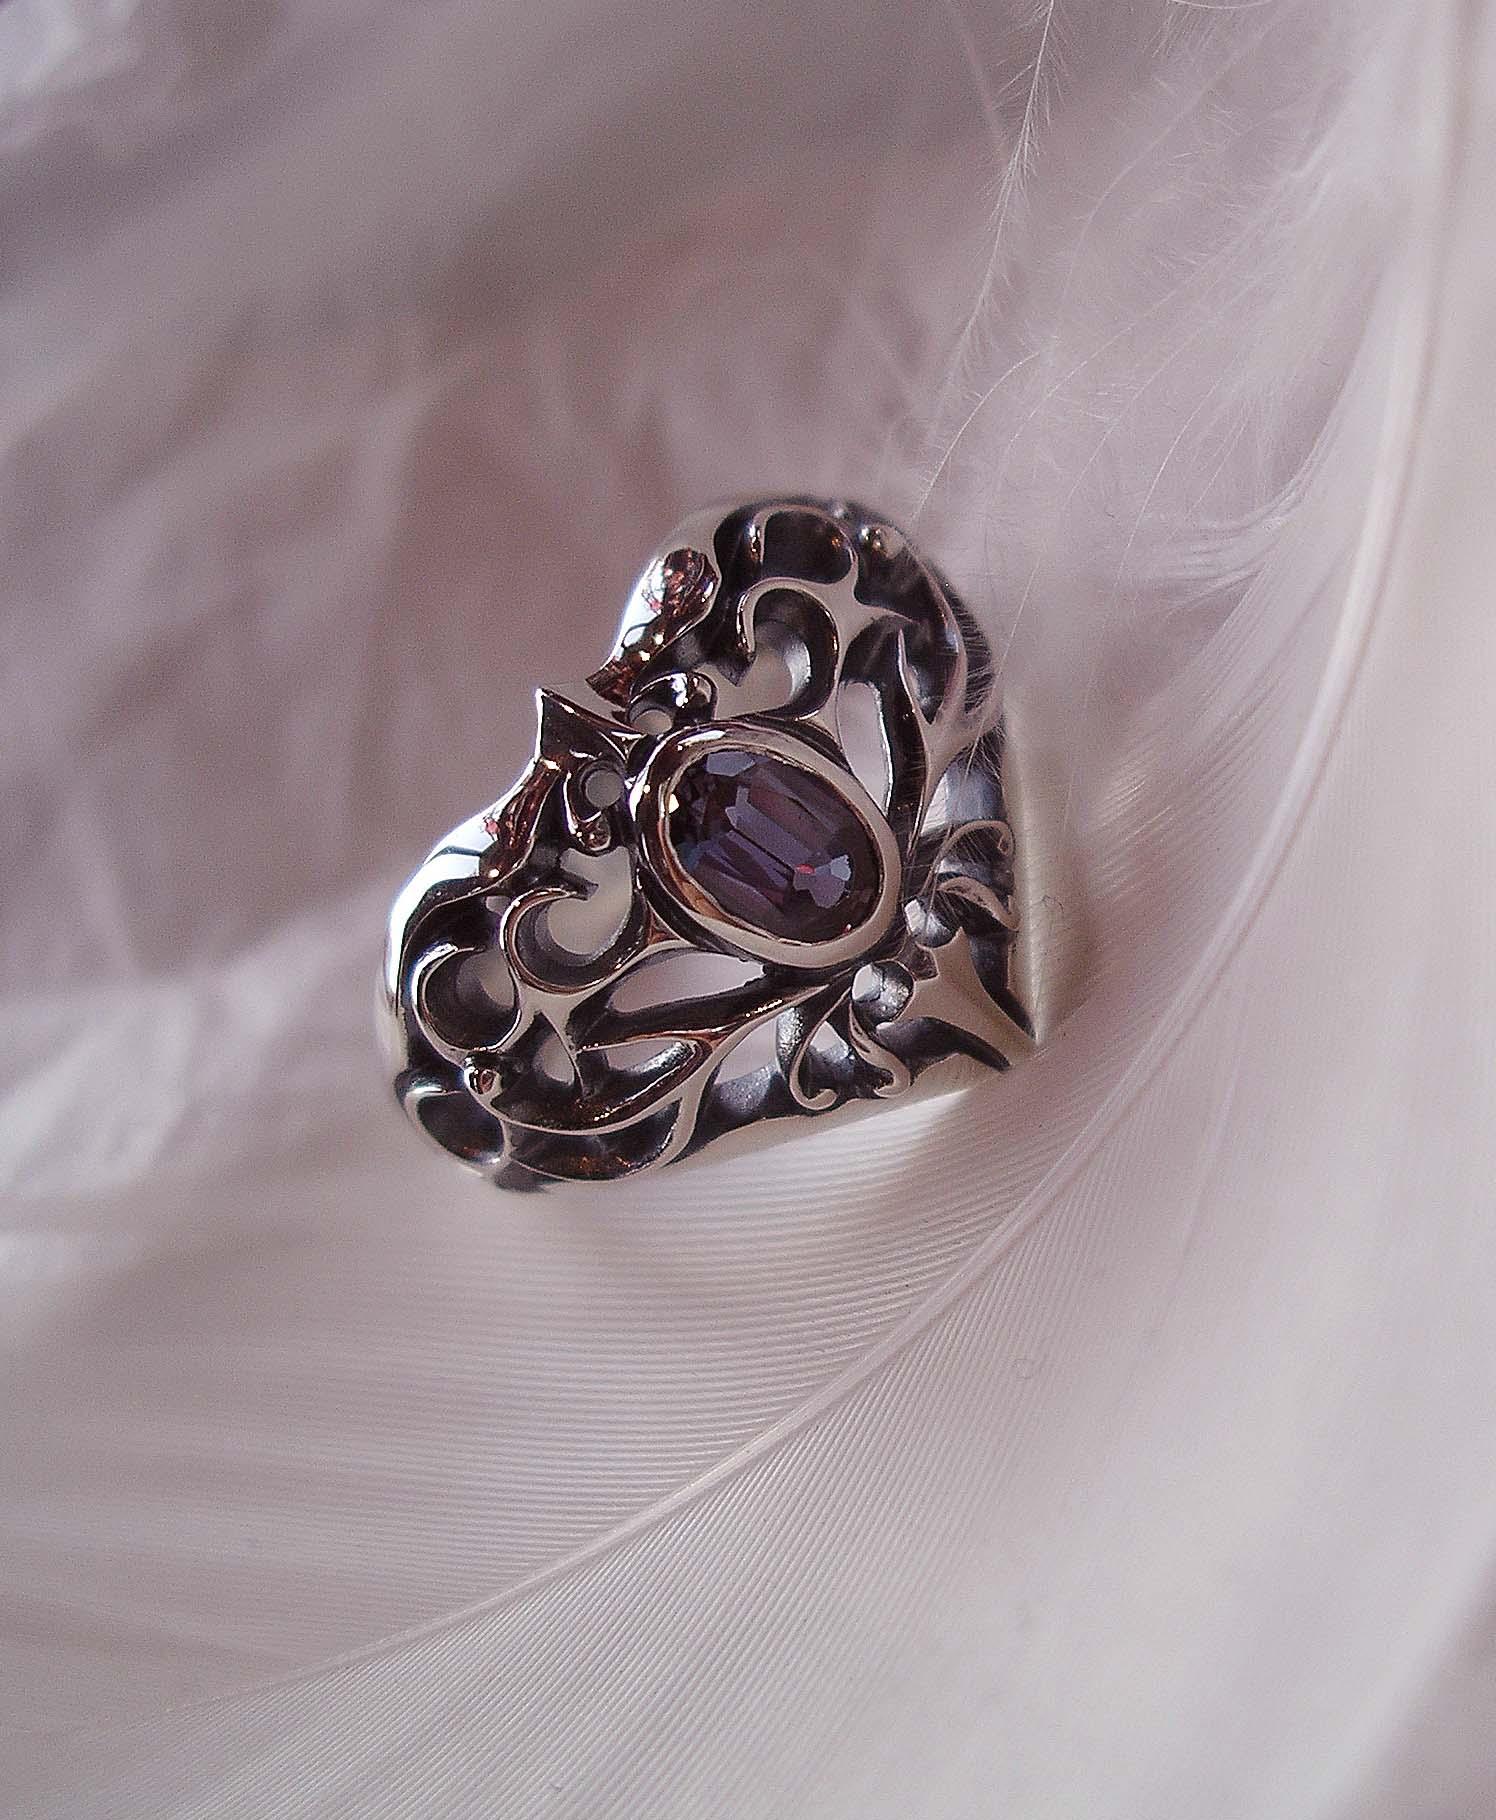 Bloody Rose オリジナルリング✙ソーサラーリング sorcerer's ring いぶし仕上げ